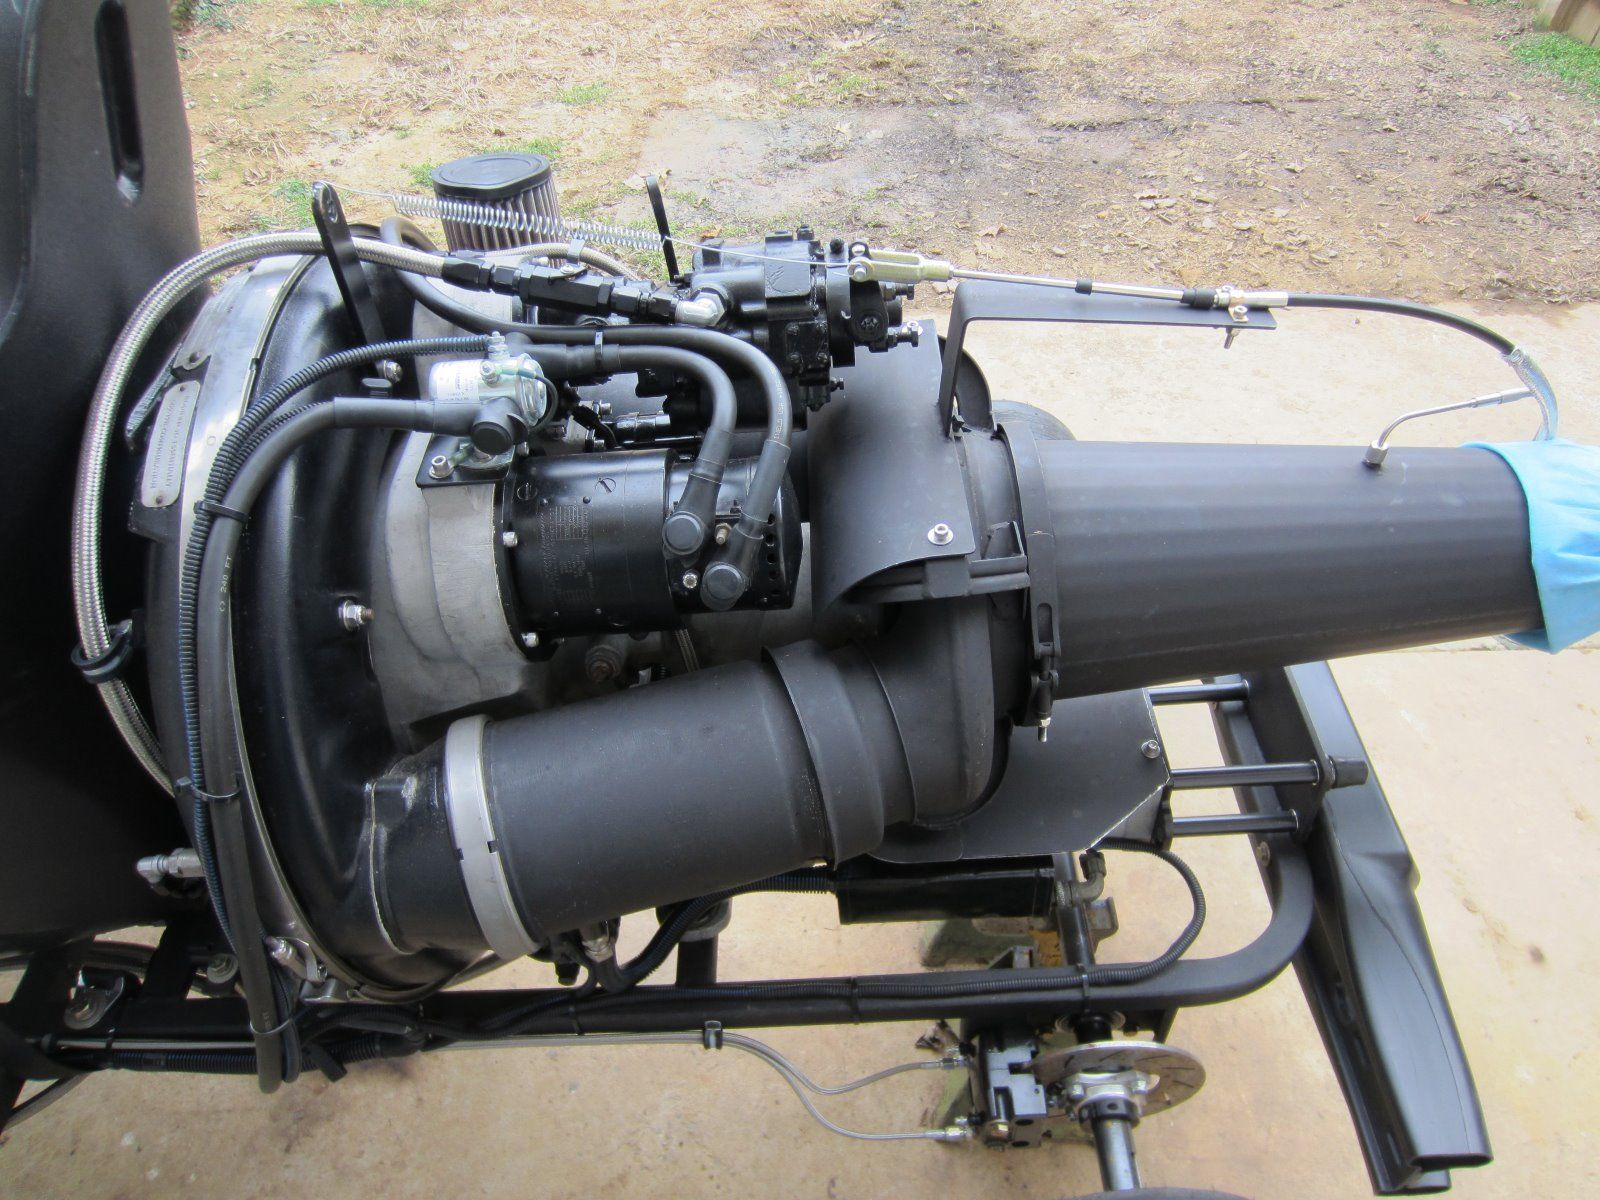 Go Kart with a Gas Turbine Engine – Engine Swap Depot